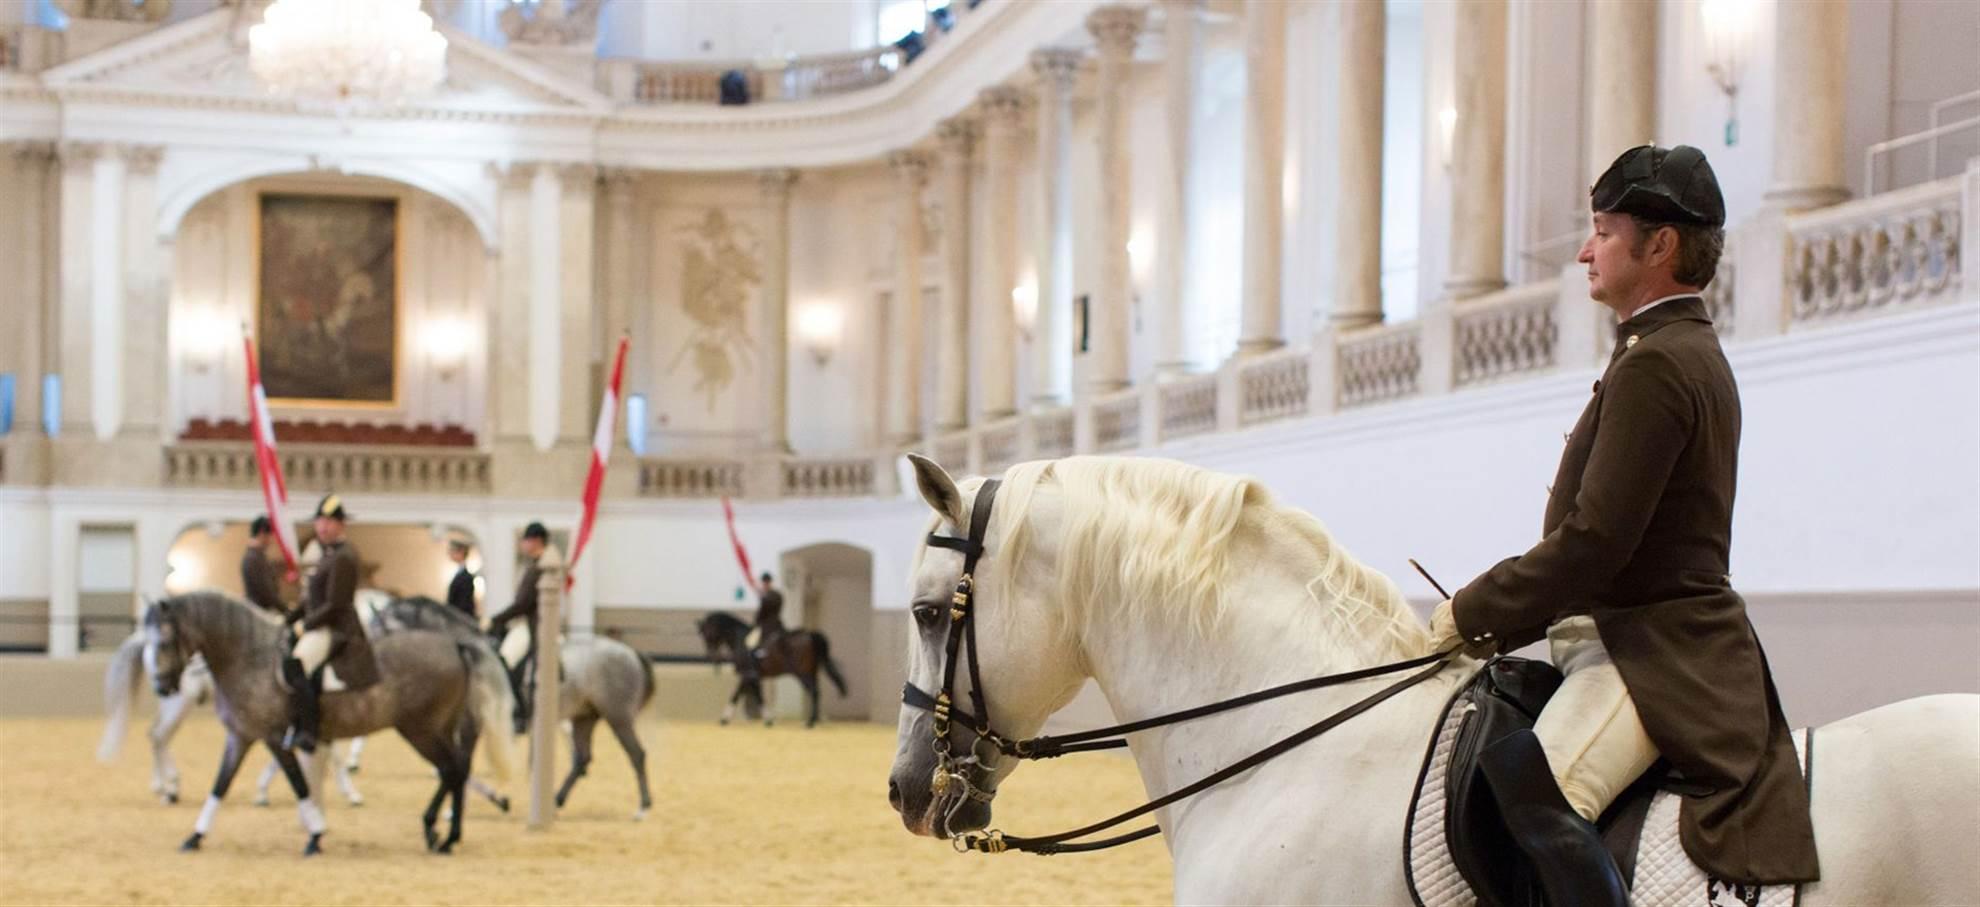 Spanish Riding School - MORNING EXERCISE